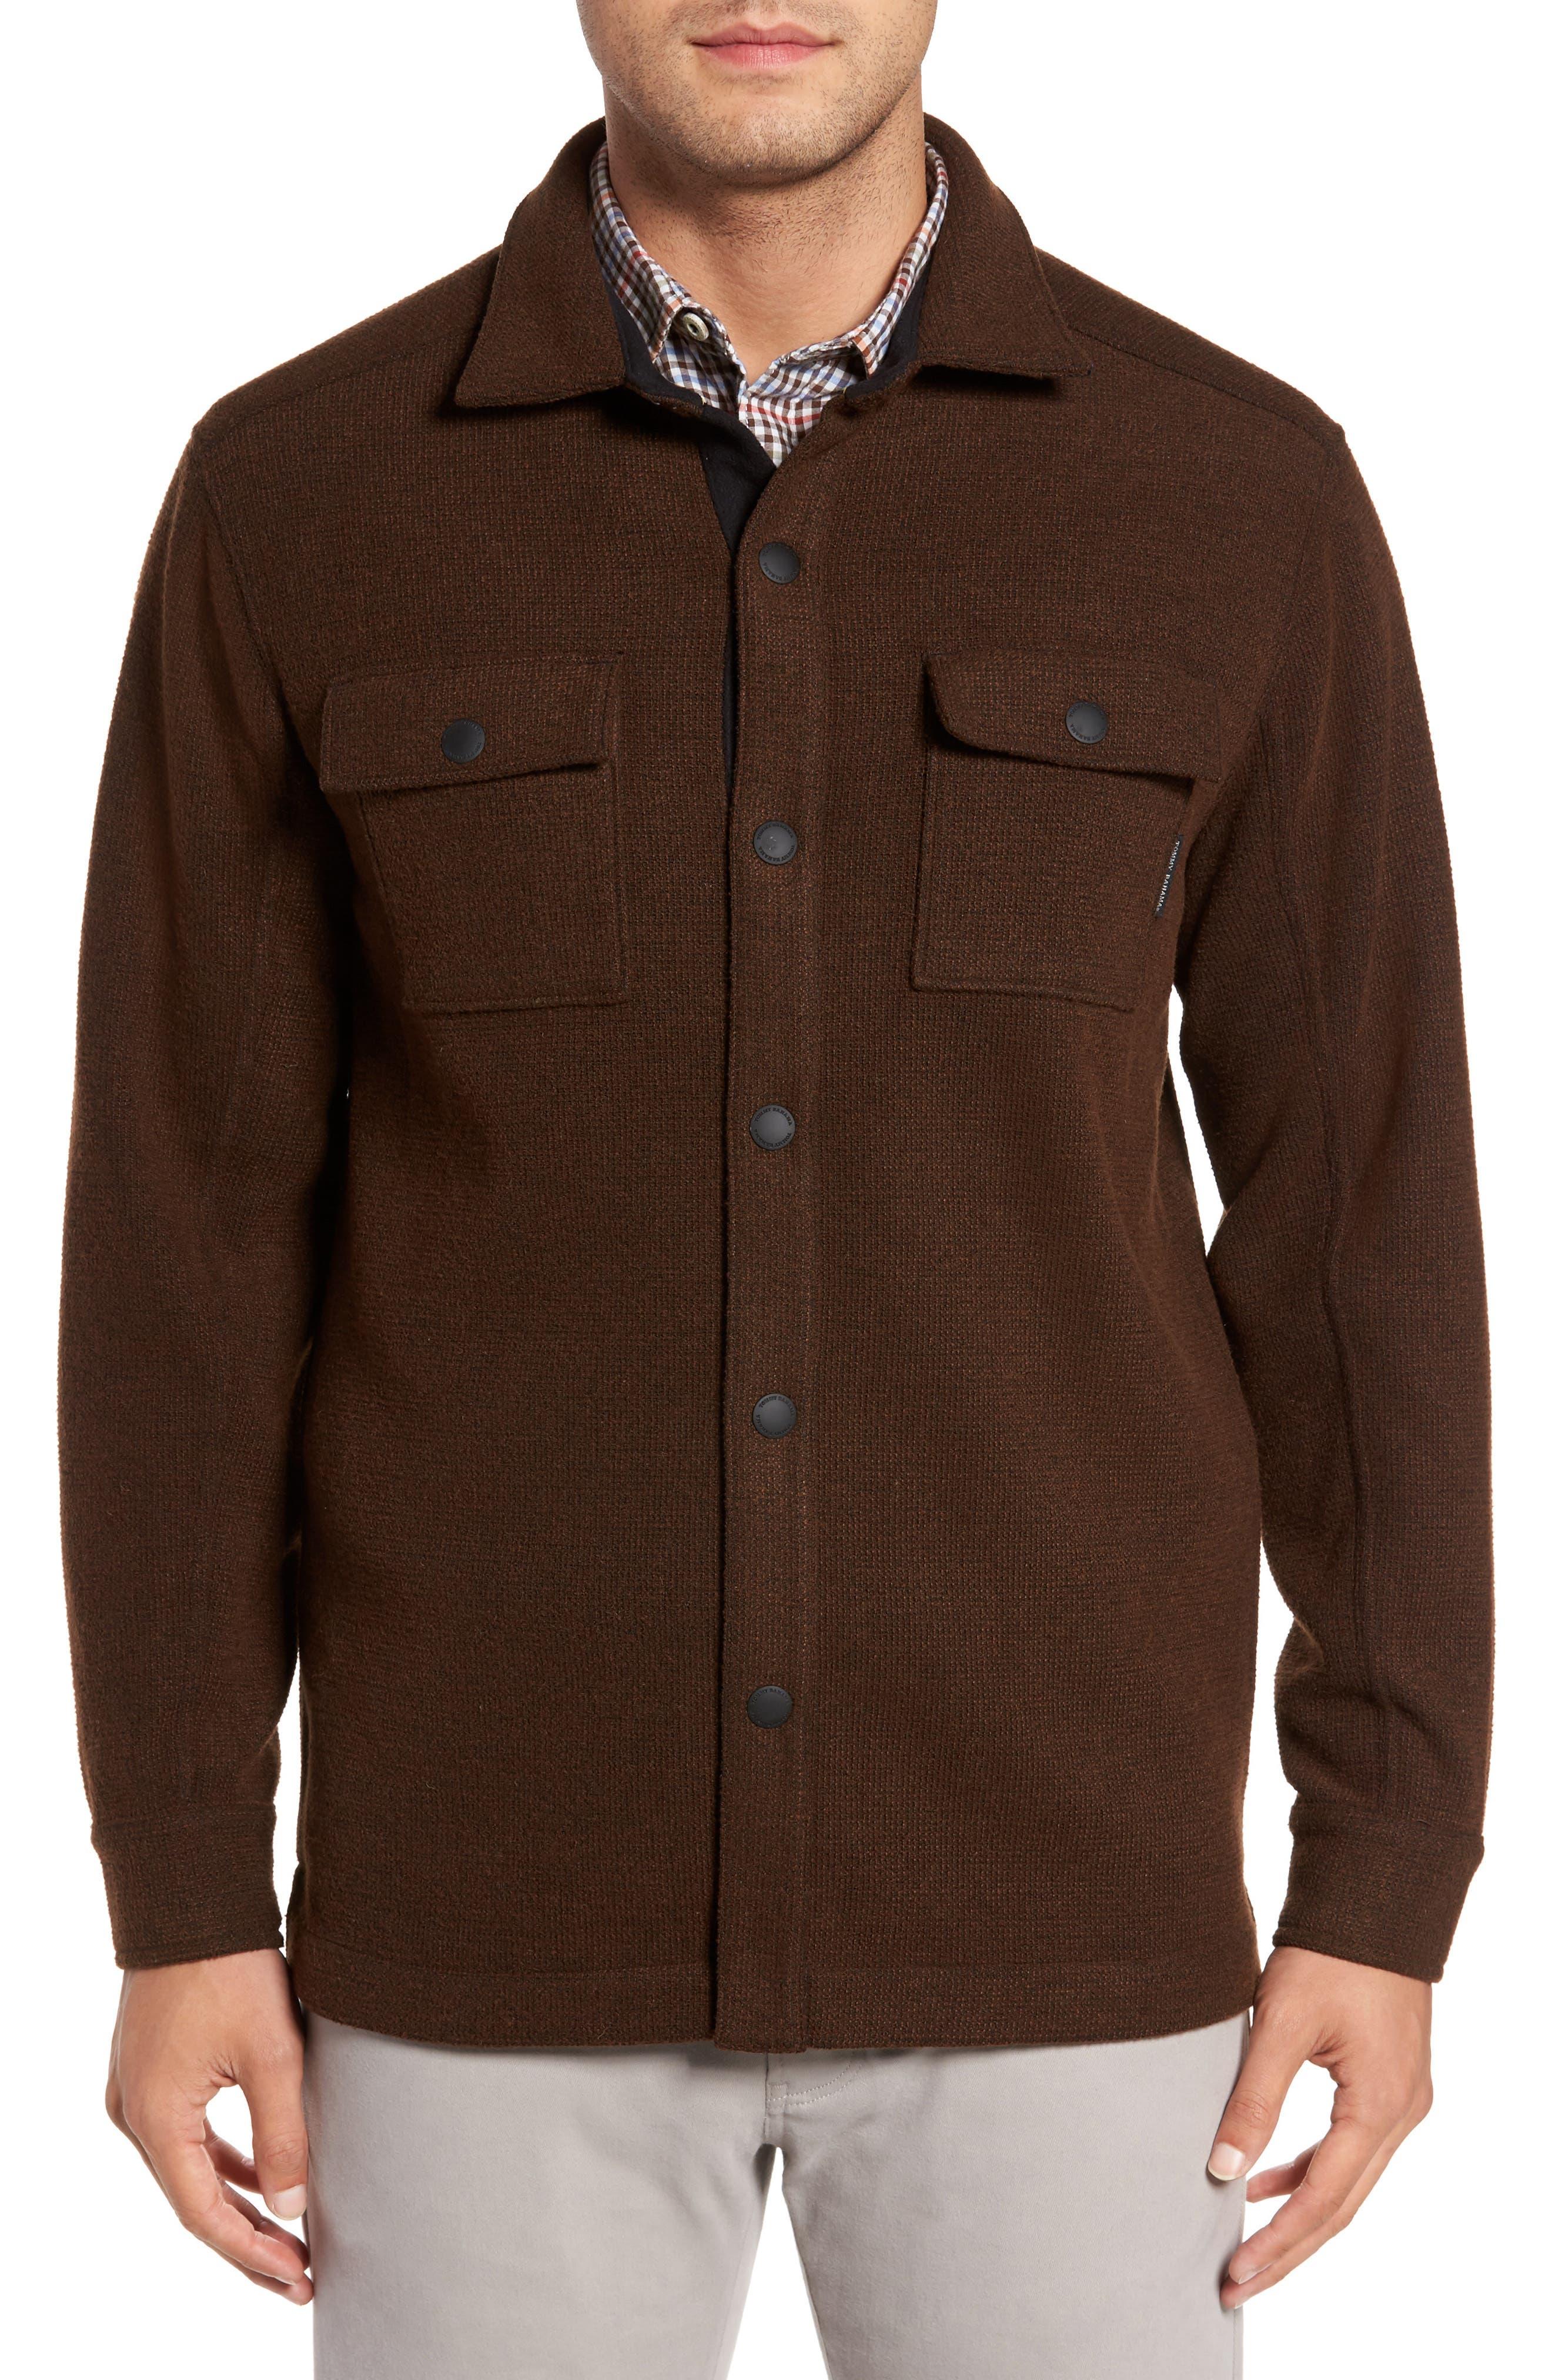 Paradise Creek Snap Front Fleece Jacket,                         Main,                         color, Double Chocolate